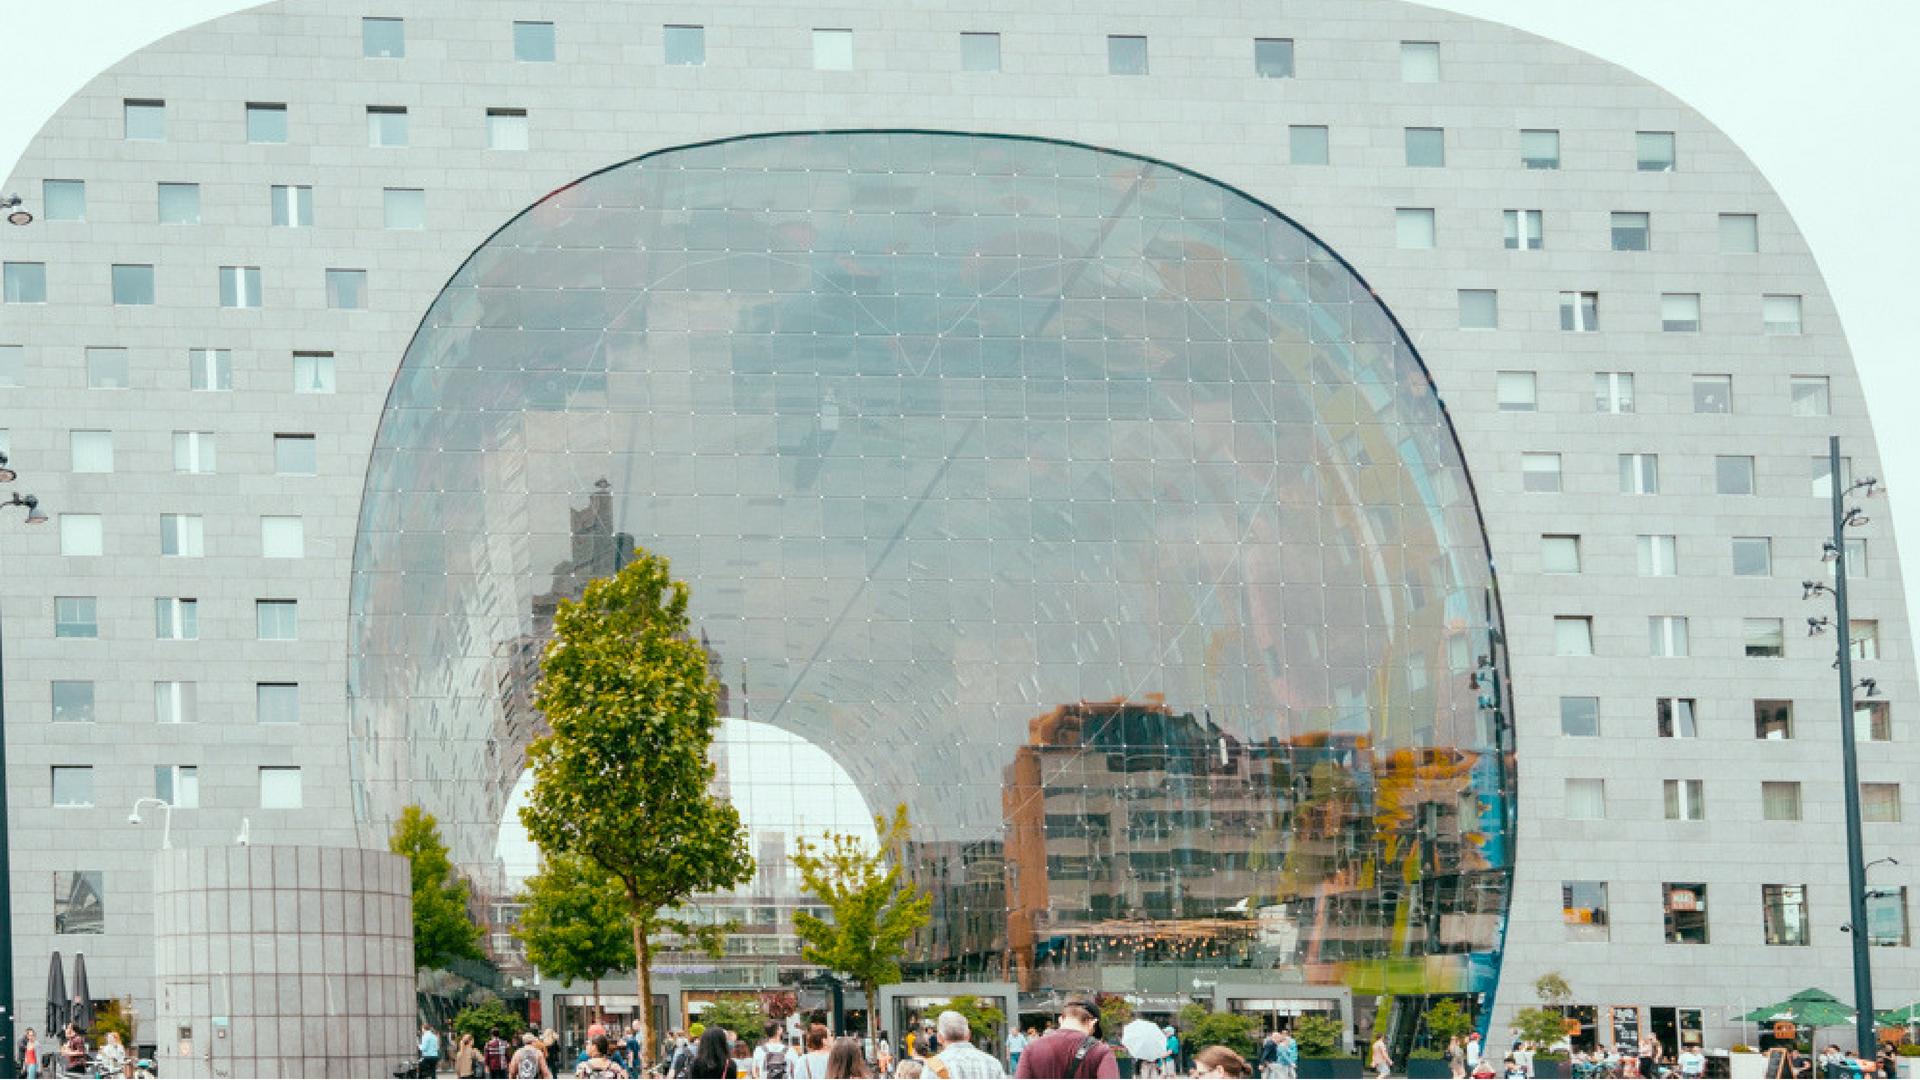 5-Reasons-to-Visit-Rotterdam-3.jpg